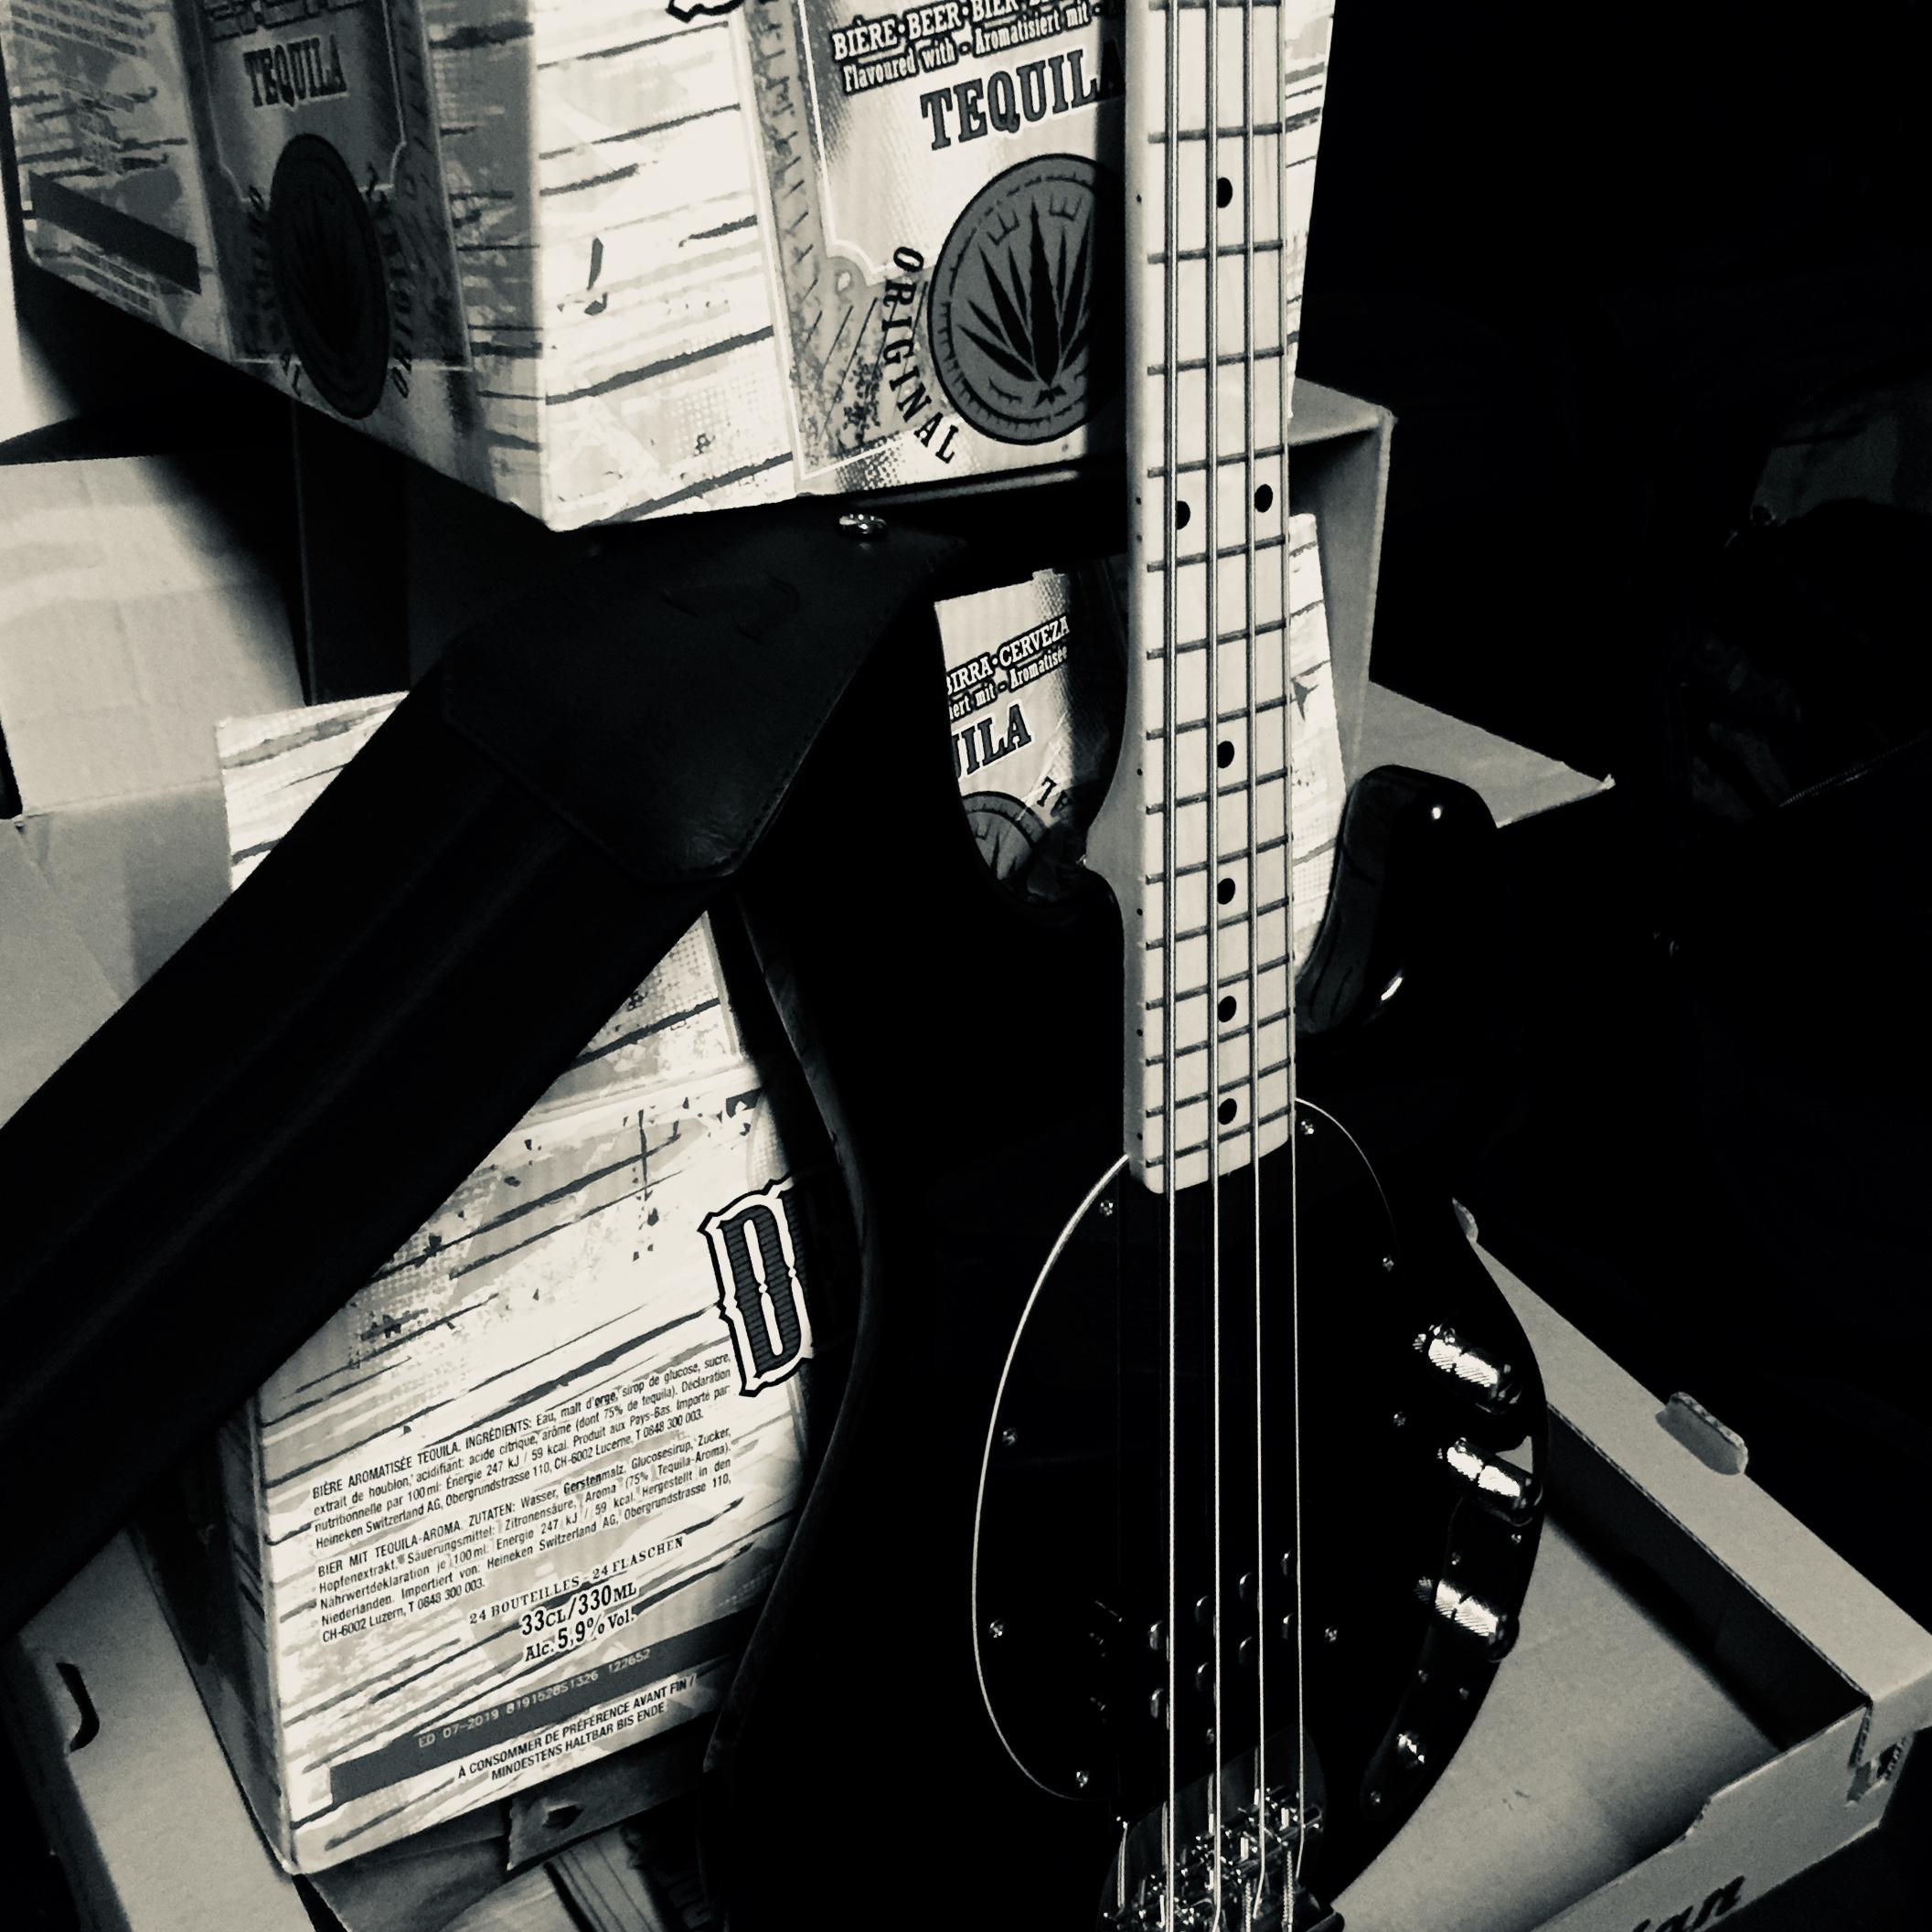 Thirsty bass